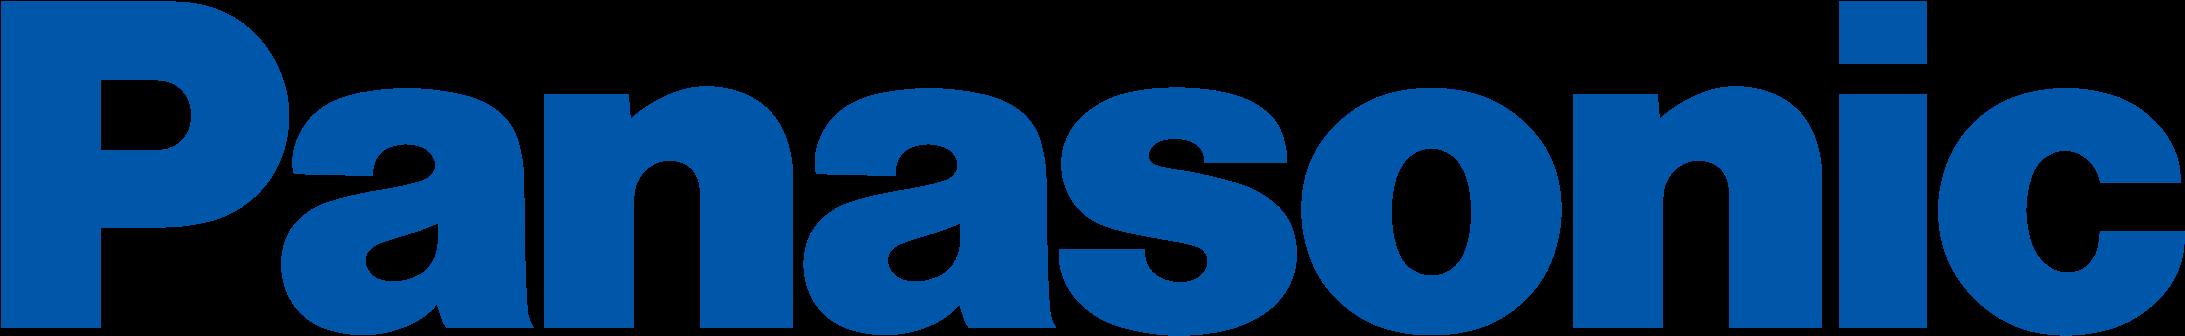 Panasonic logo clipart